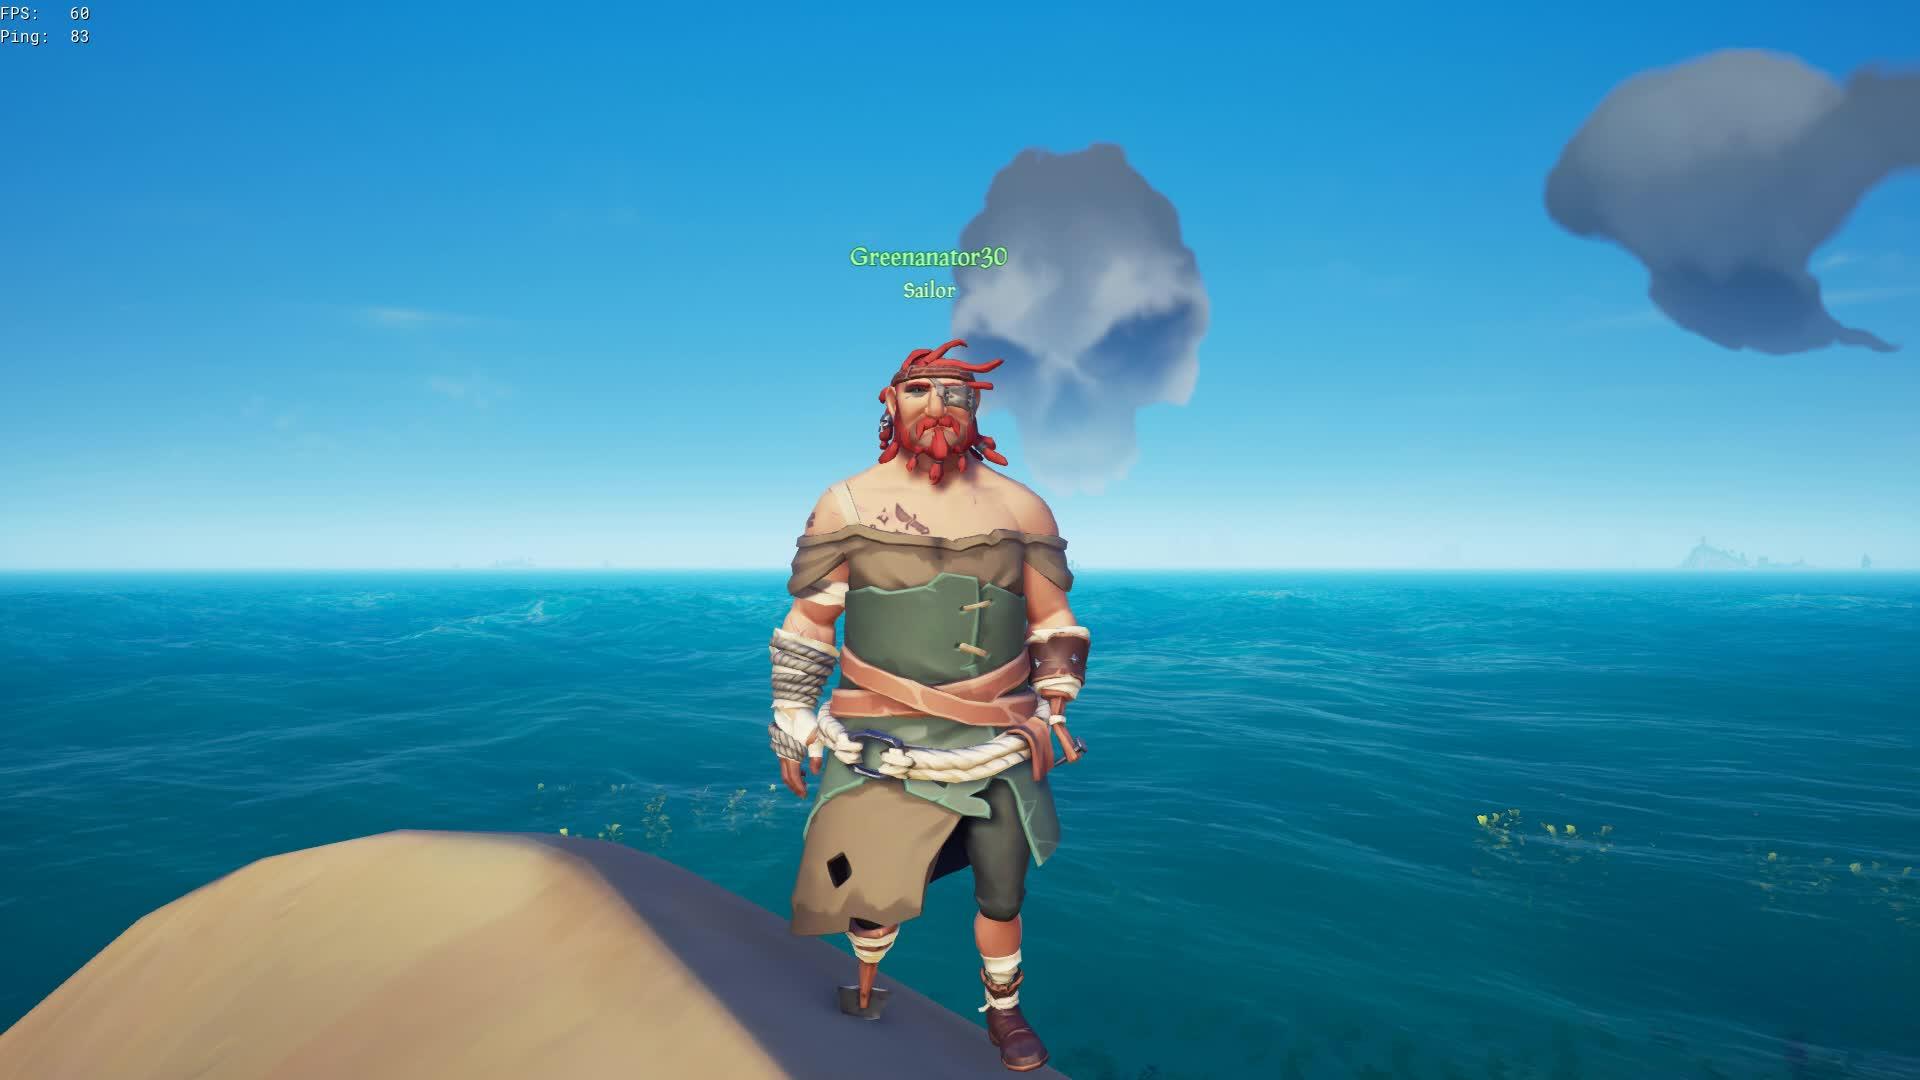 seaofthieves, Sea of Thieves 2019.01.23 - 15.18.19.05 GIFs